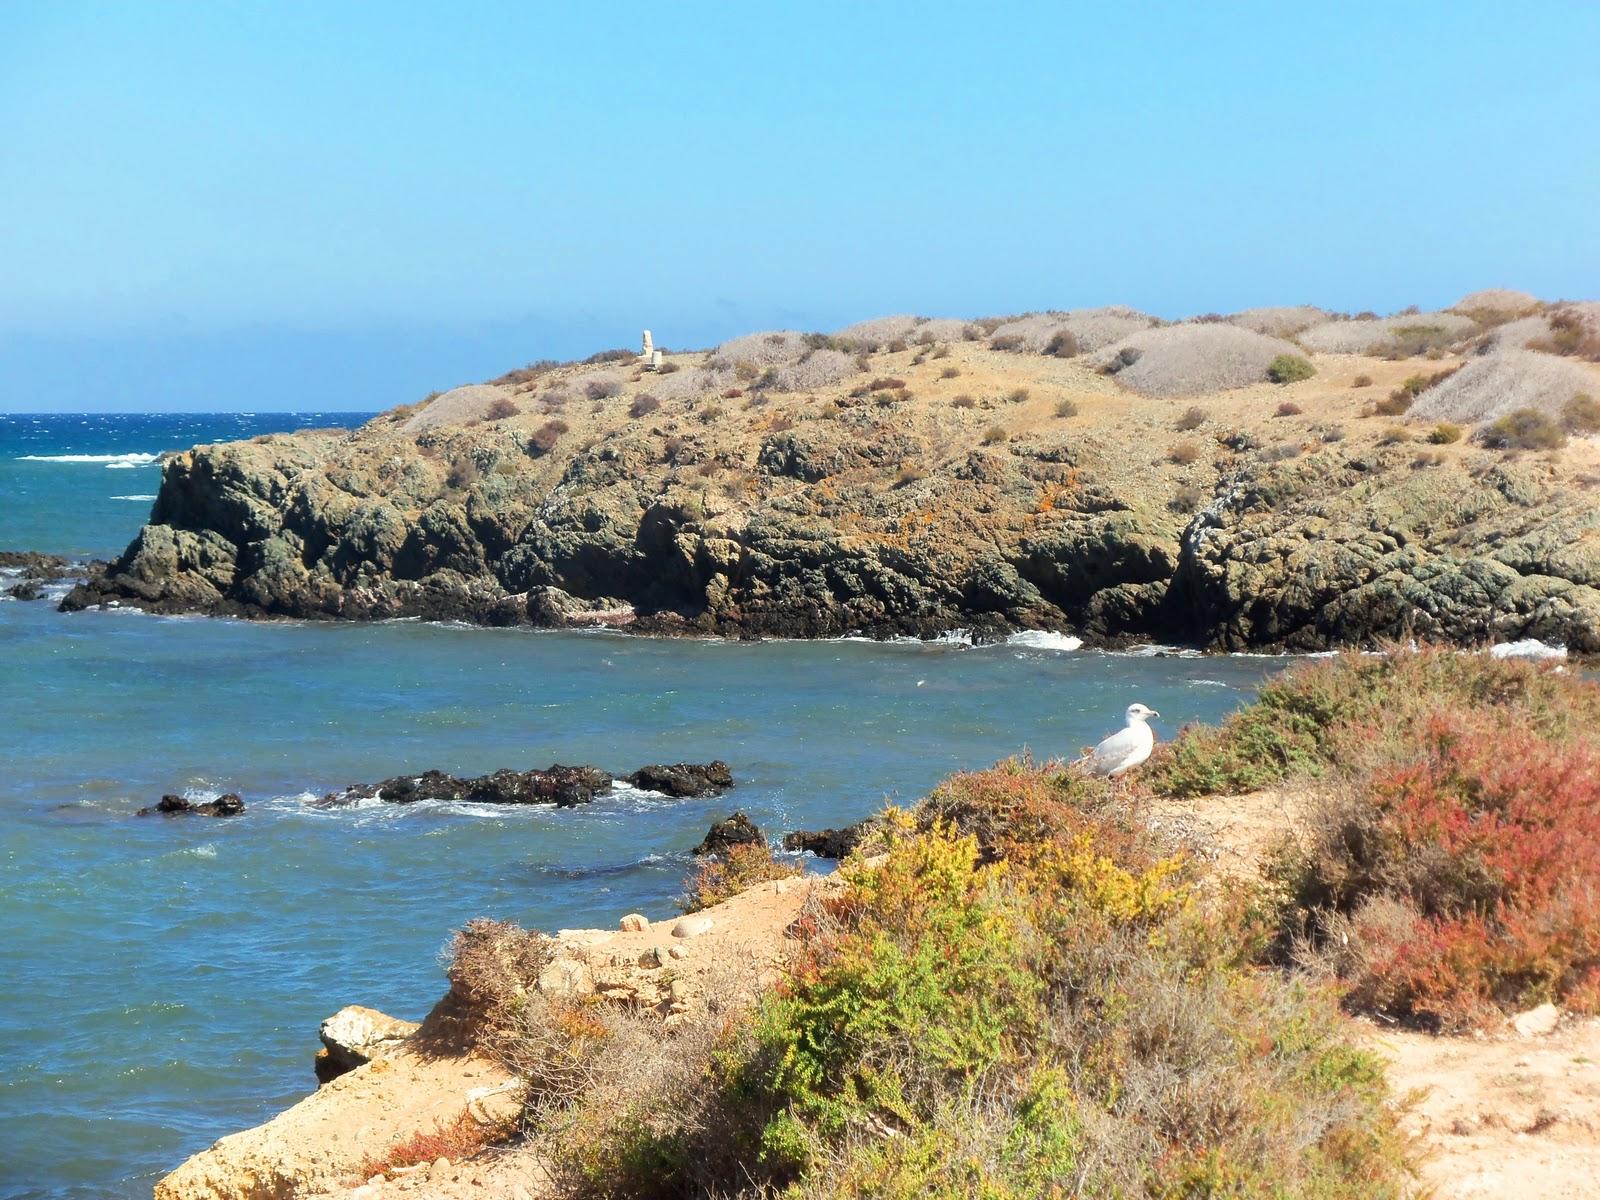 La ondina inquieta la isla de tabarca - Hoteles en isla tabarca ...